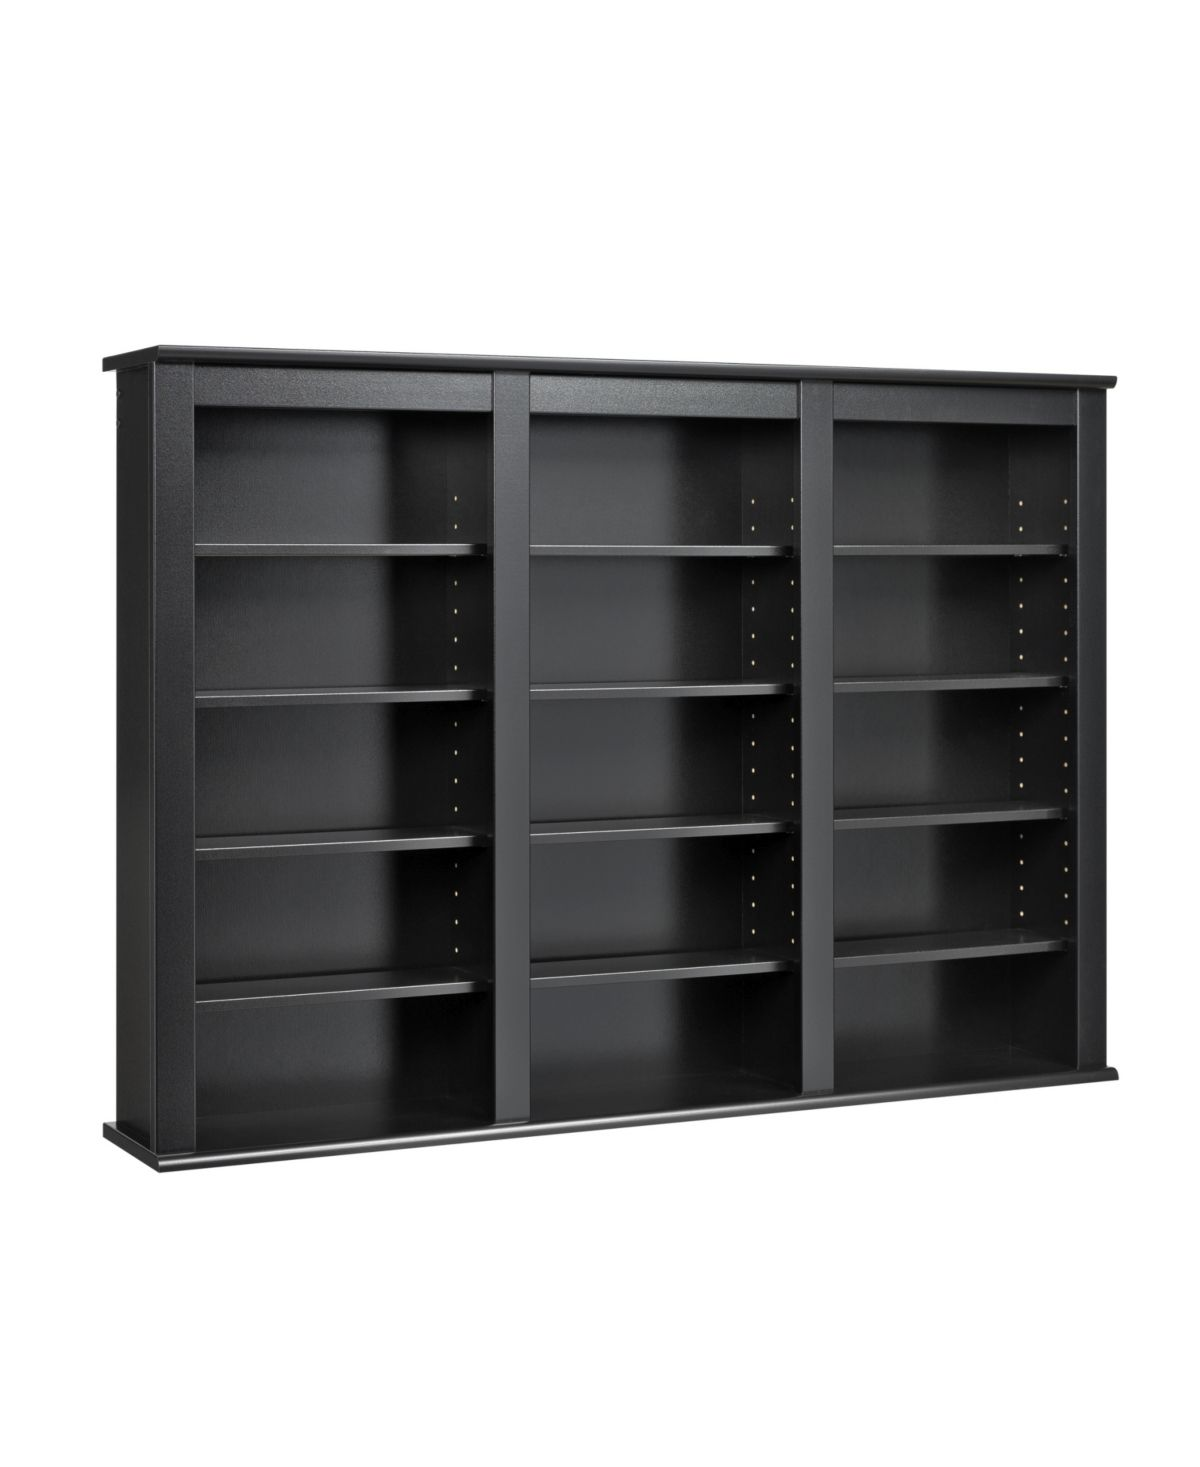 Prepac Triple Wall Mounted Storage Reviews Furniture Macy S Wall Mounted Storage Shelves Storage Storage Shelves